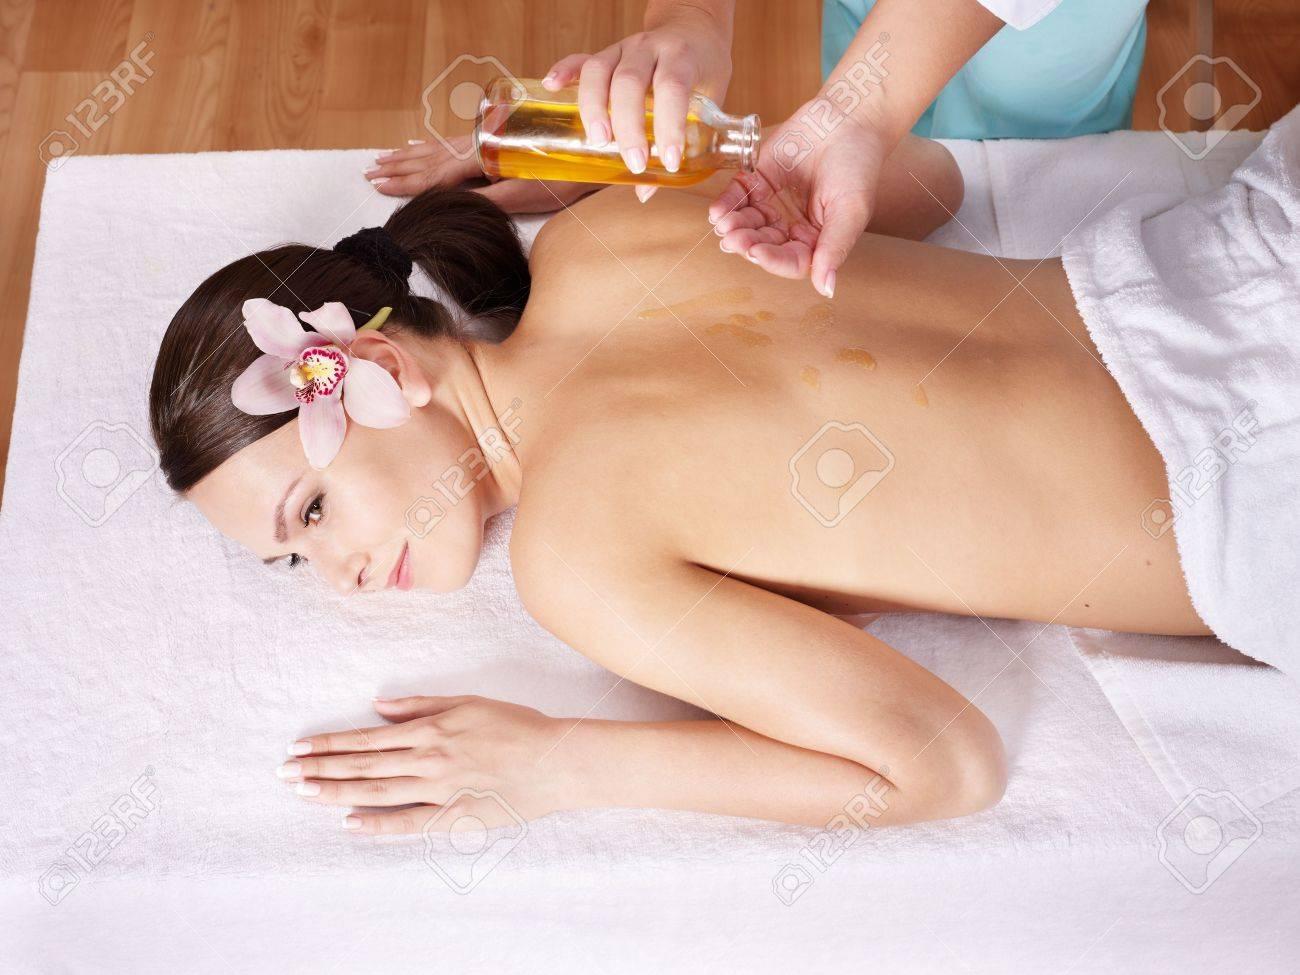 Самомассаж клитора у женщин фото 724-288